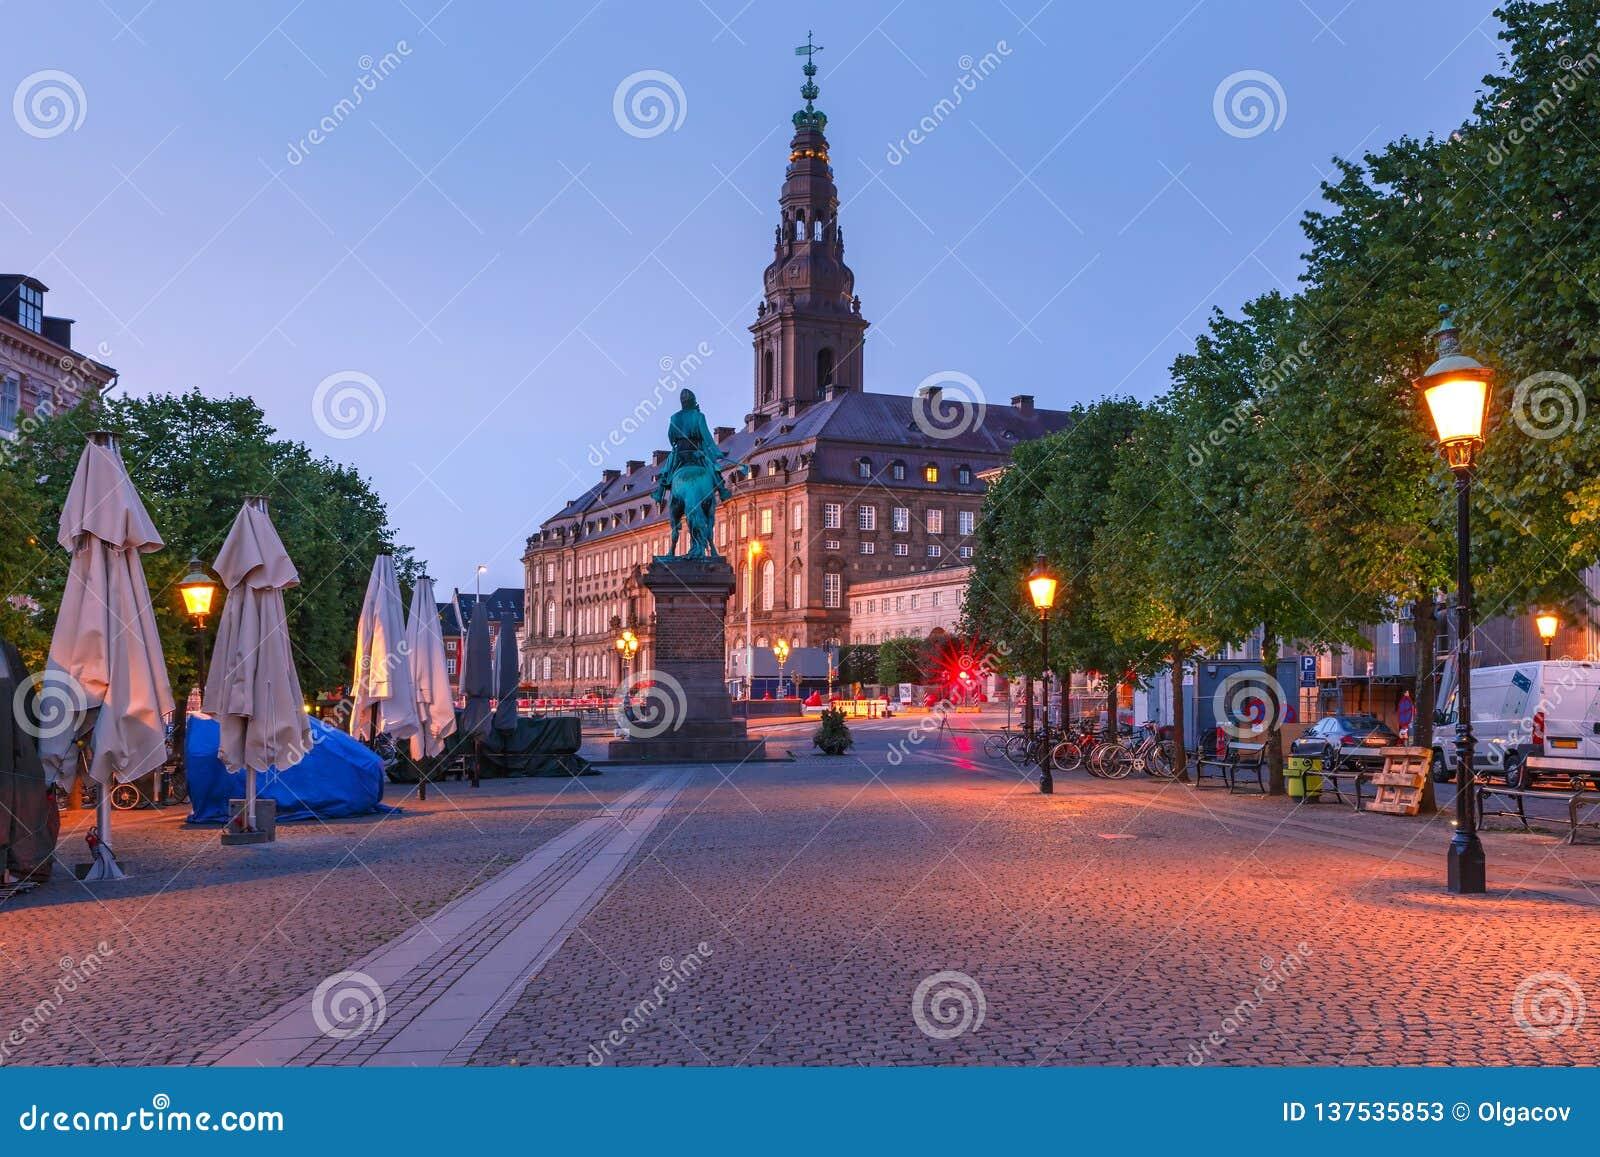 Christiansborg宫殿,哥本哈根,丹麦